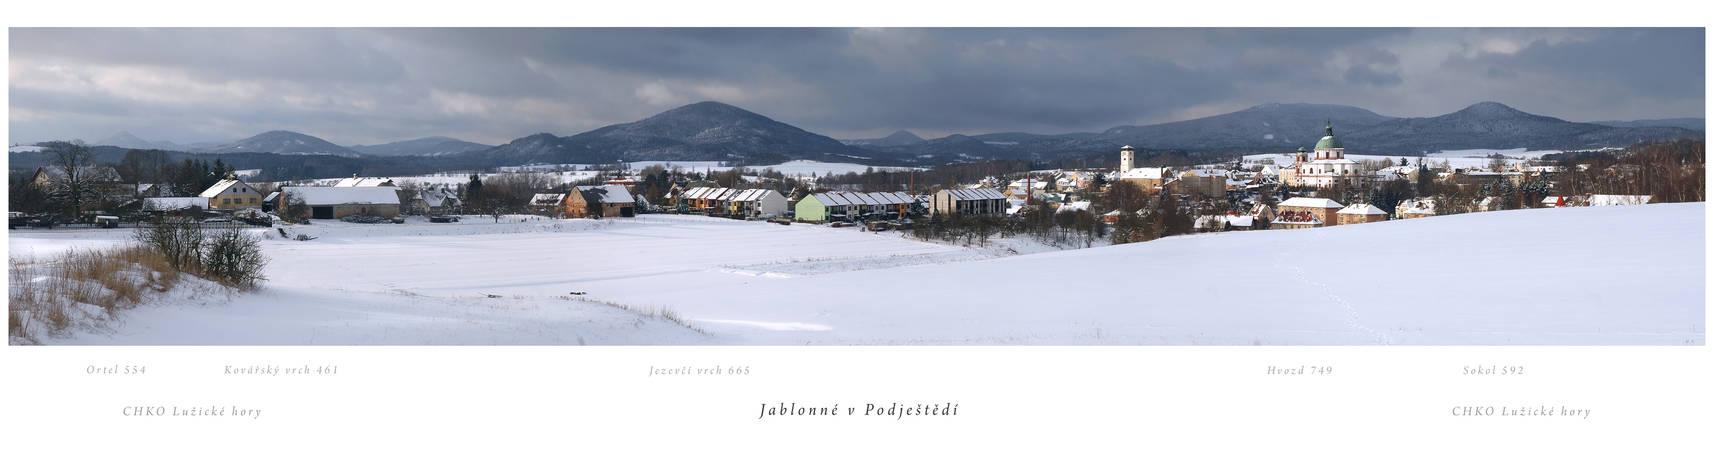 - Jablonne v Podjestedi -